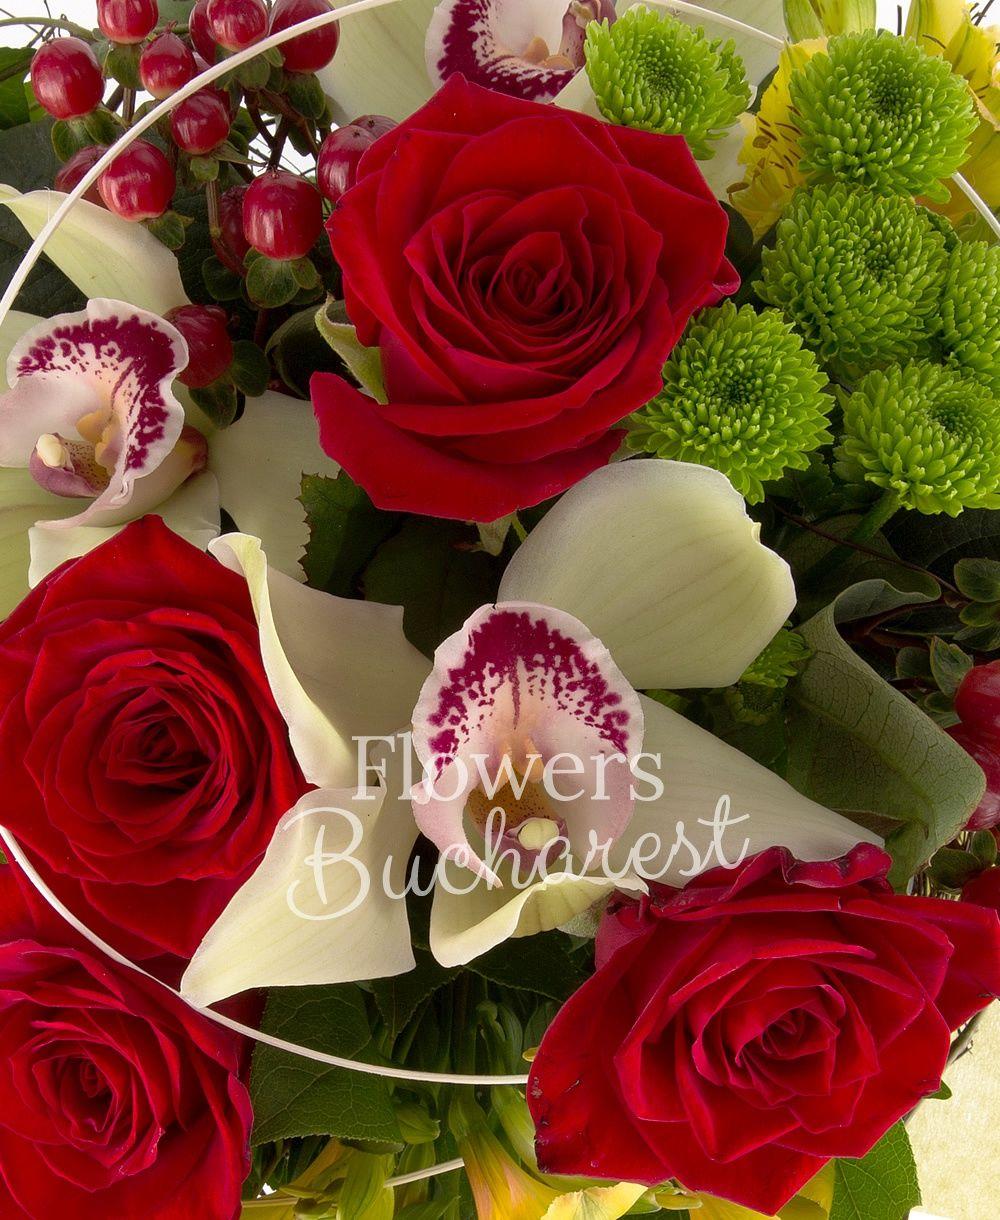 5 red roses, 5 yellow alstroemeria, 3 red hypericum, 2 green santini, green cymbidium, greenery